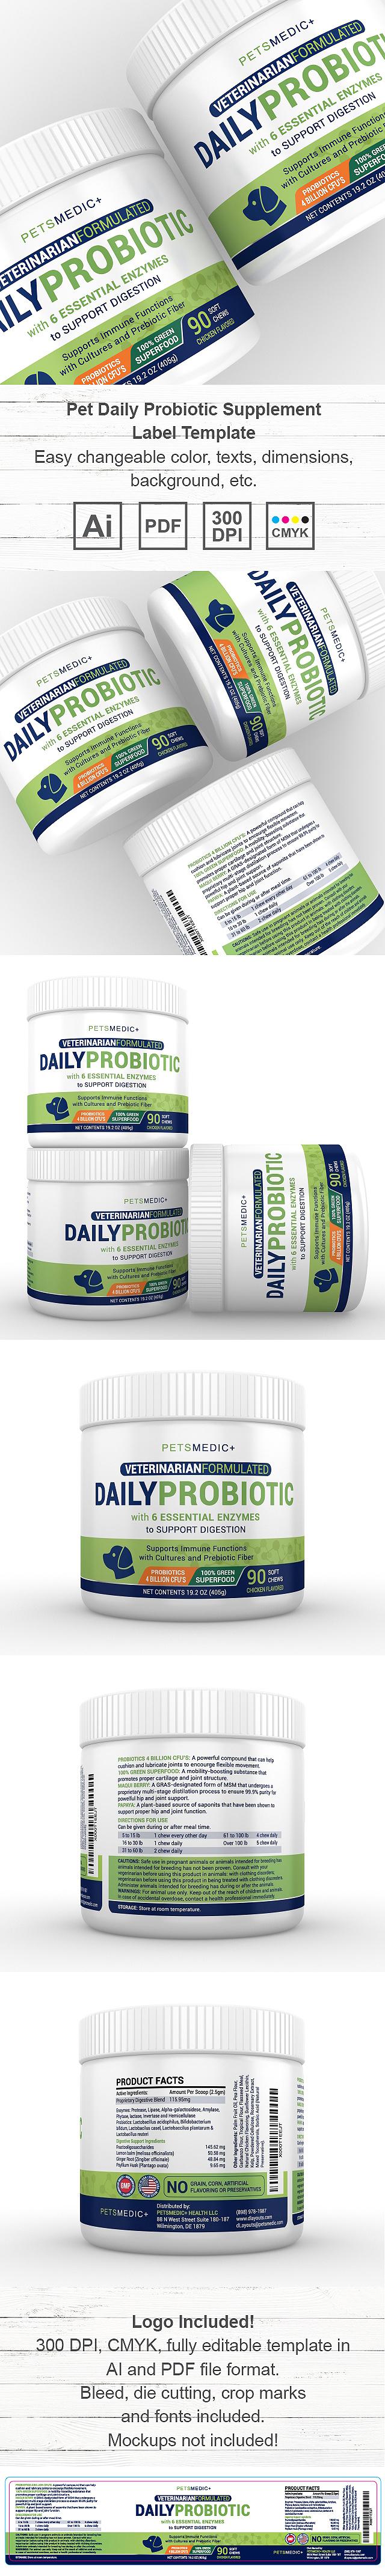 Pet Daily Probiotic Supplement Label Template